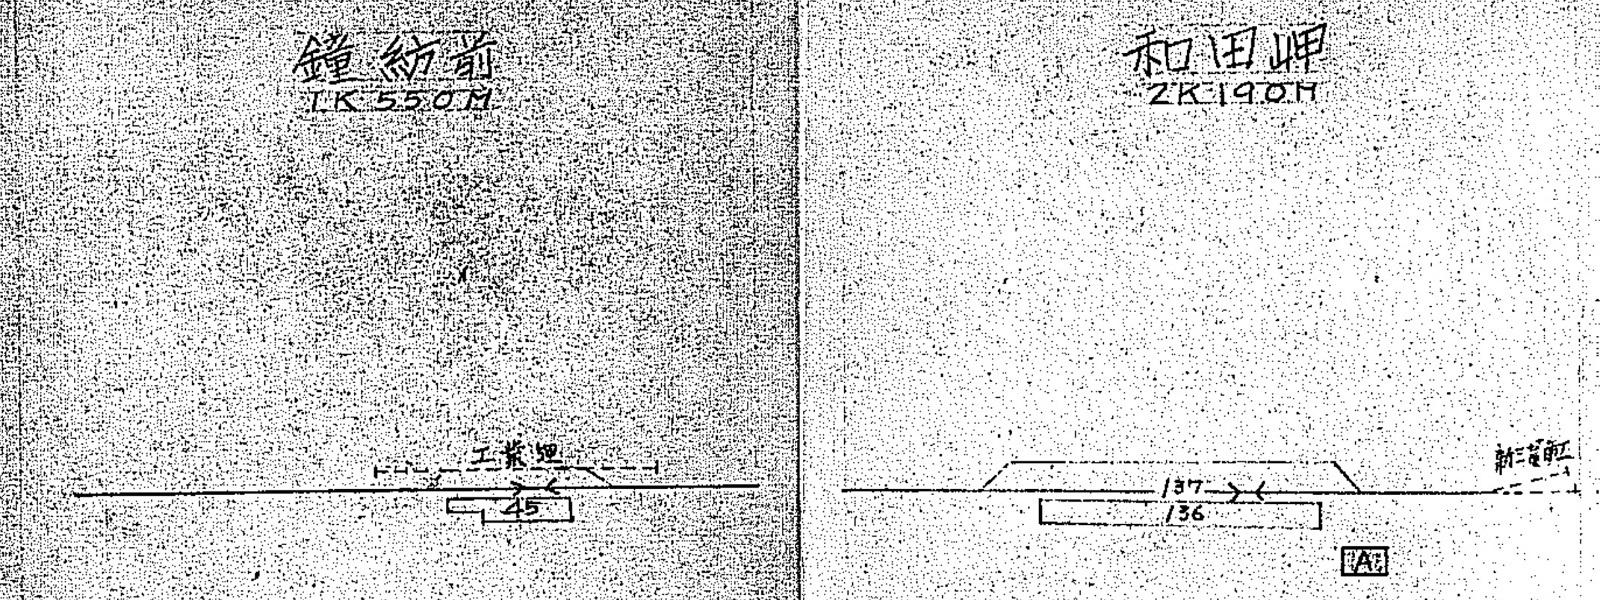 195901r_3